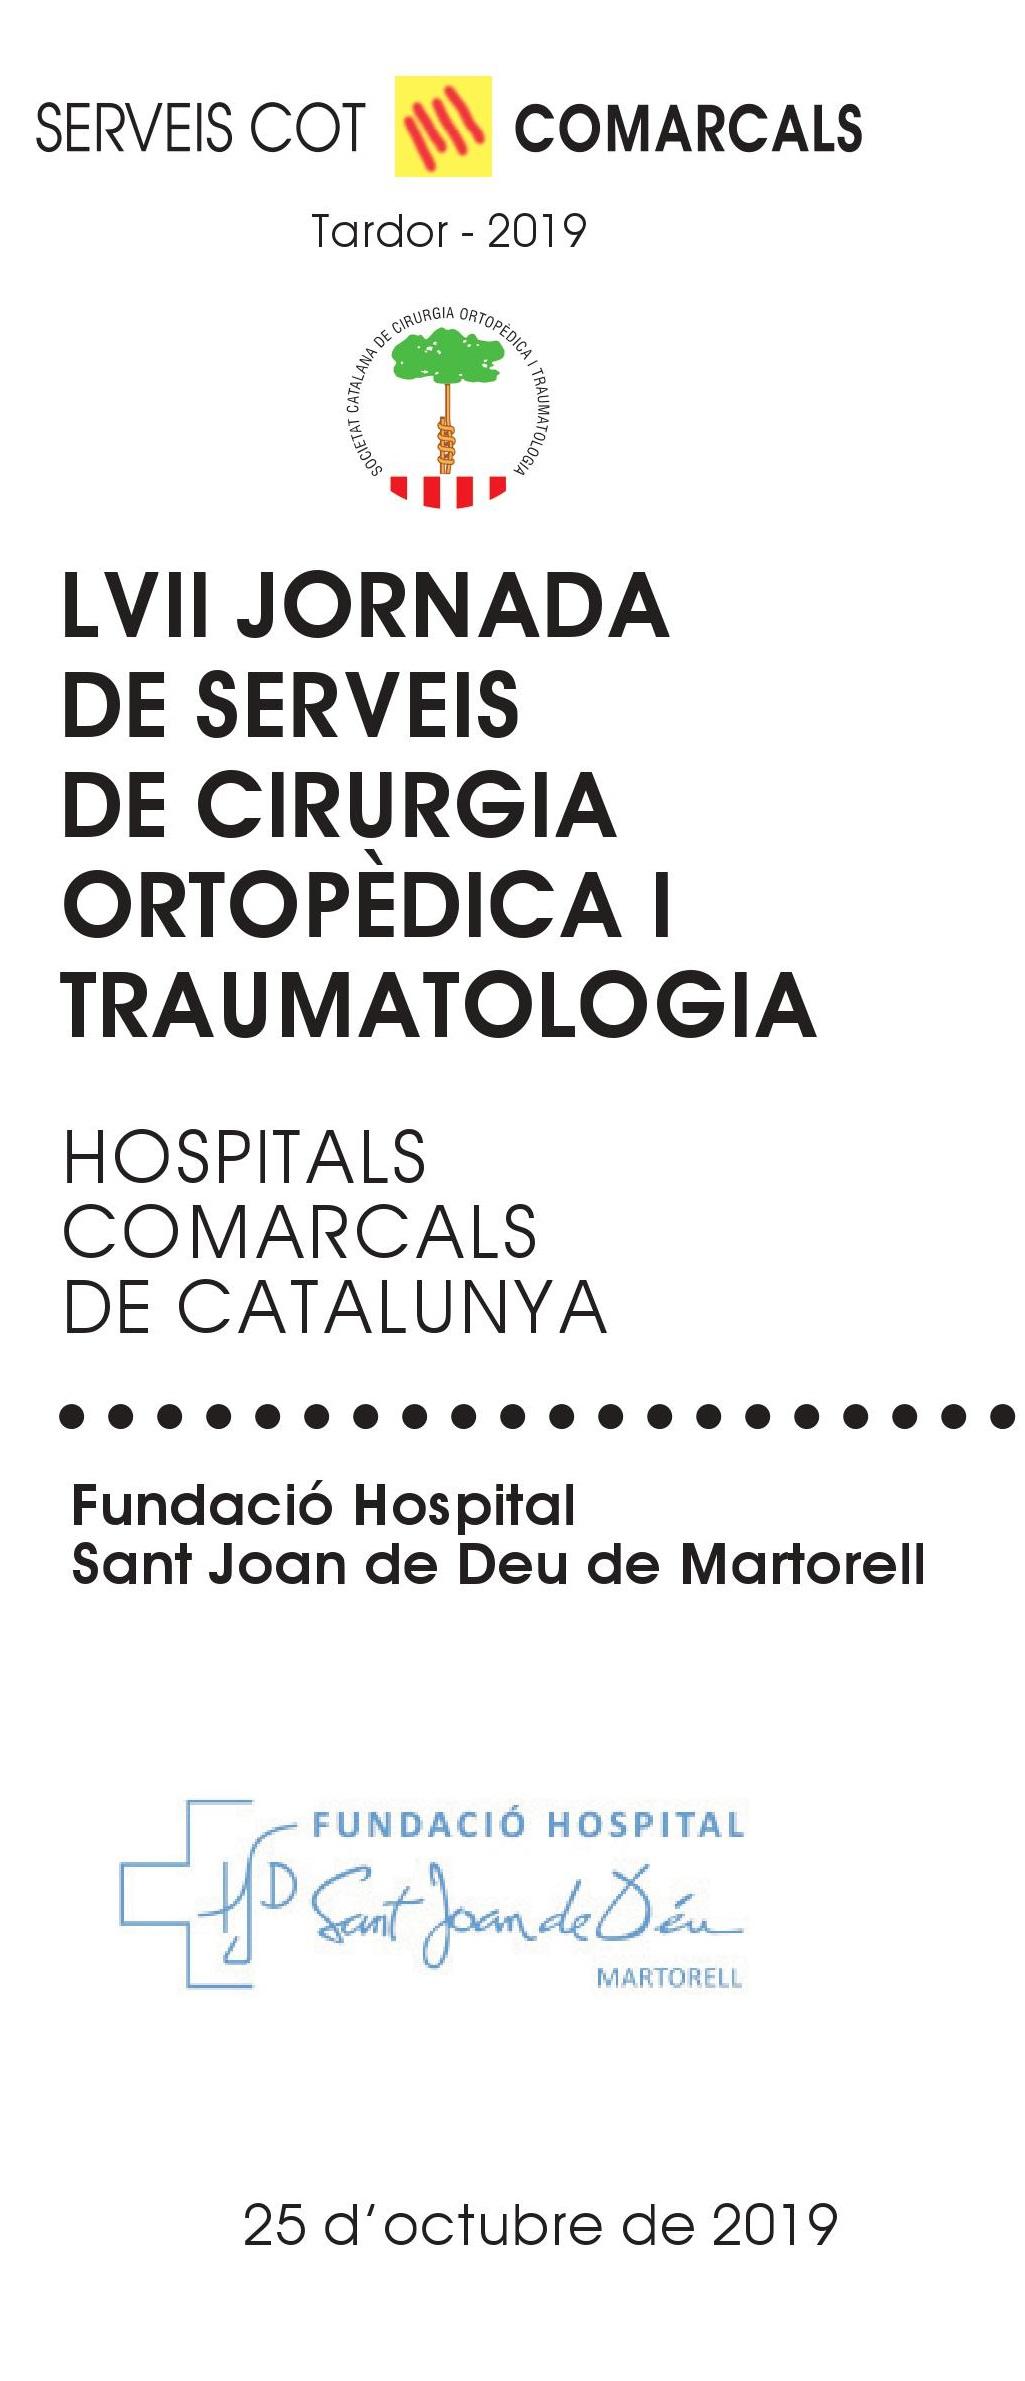 Jornada de serveis de cirugia ortopèdica i traumatologia